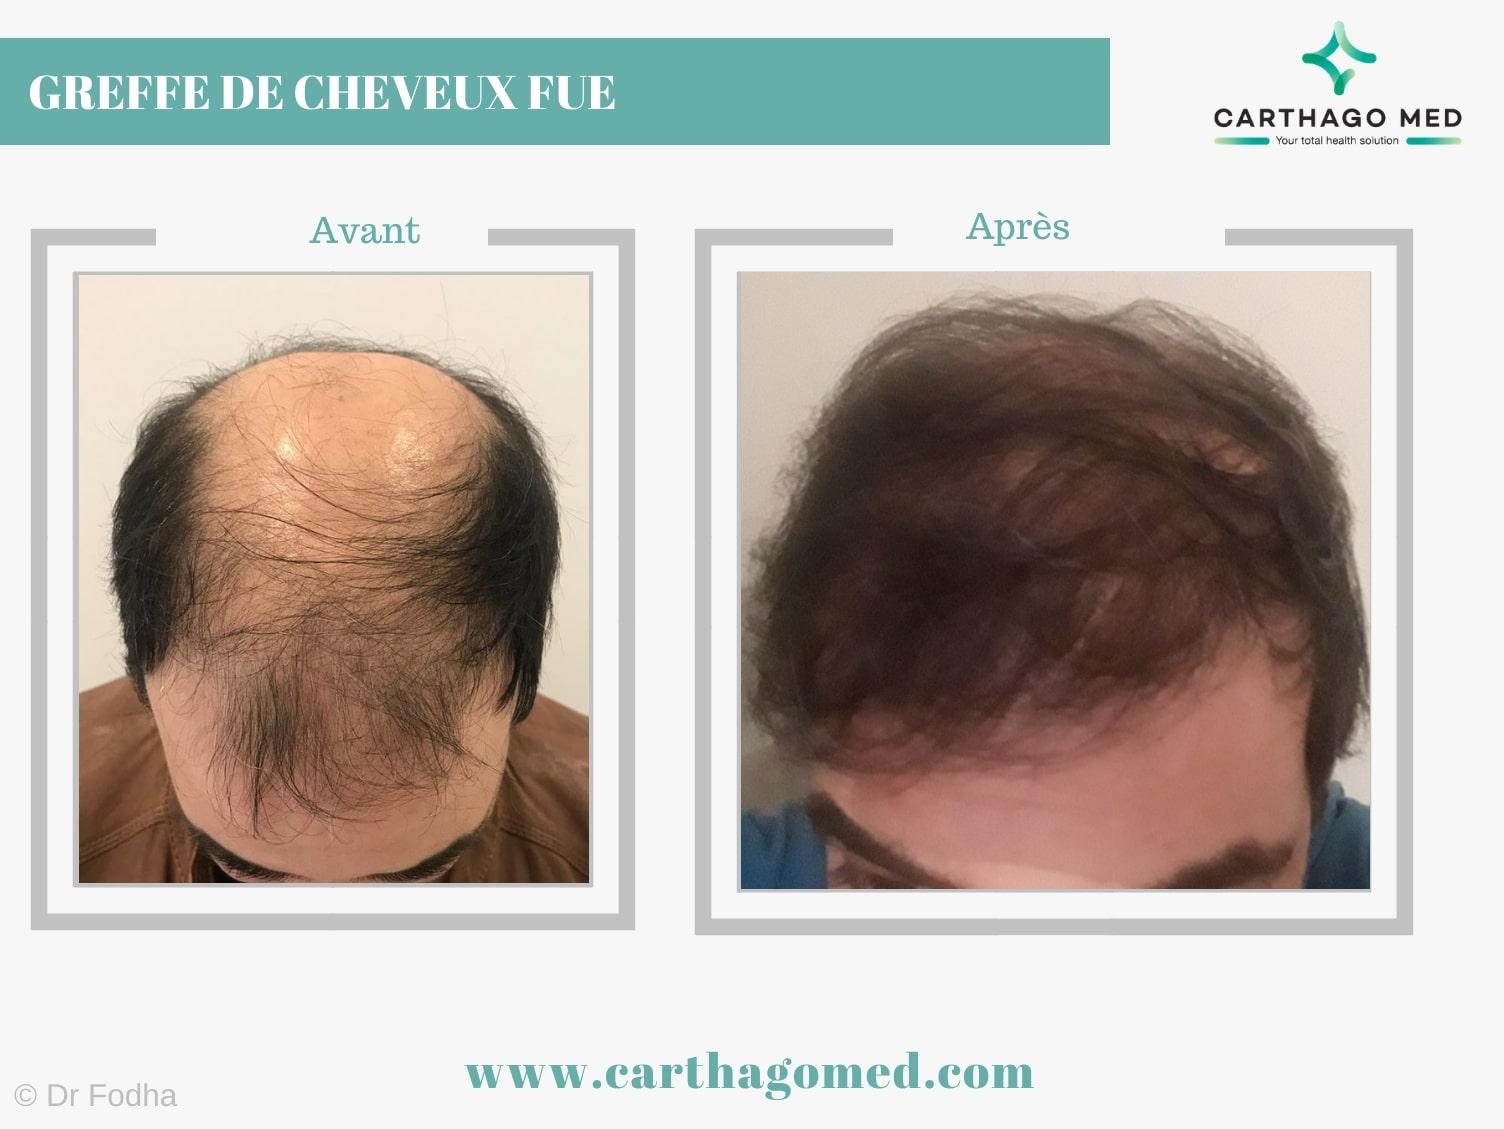 Greffe de cheveux FUE Carthago Med min (2)